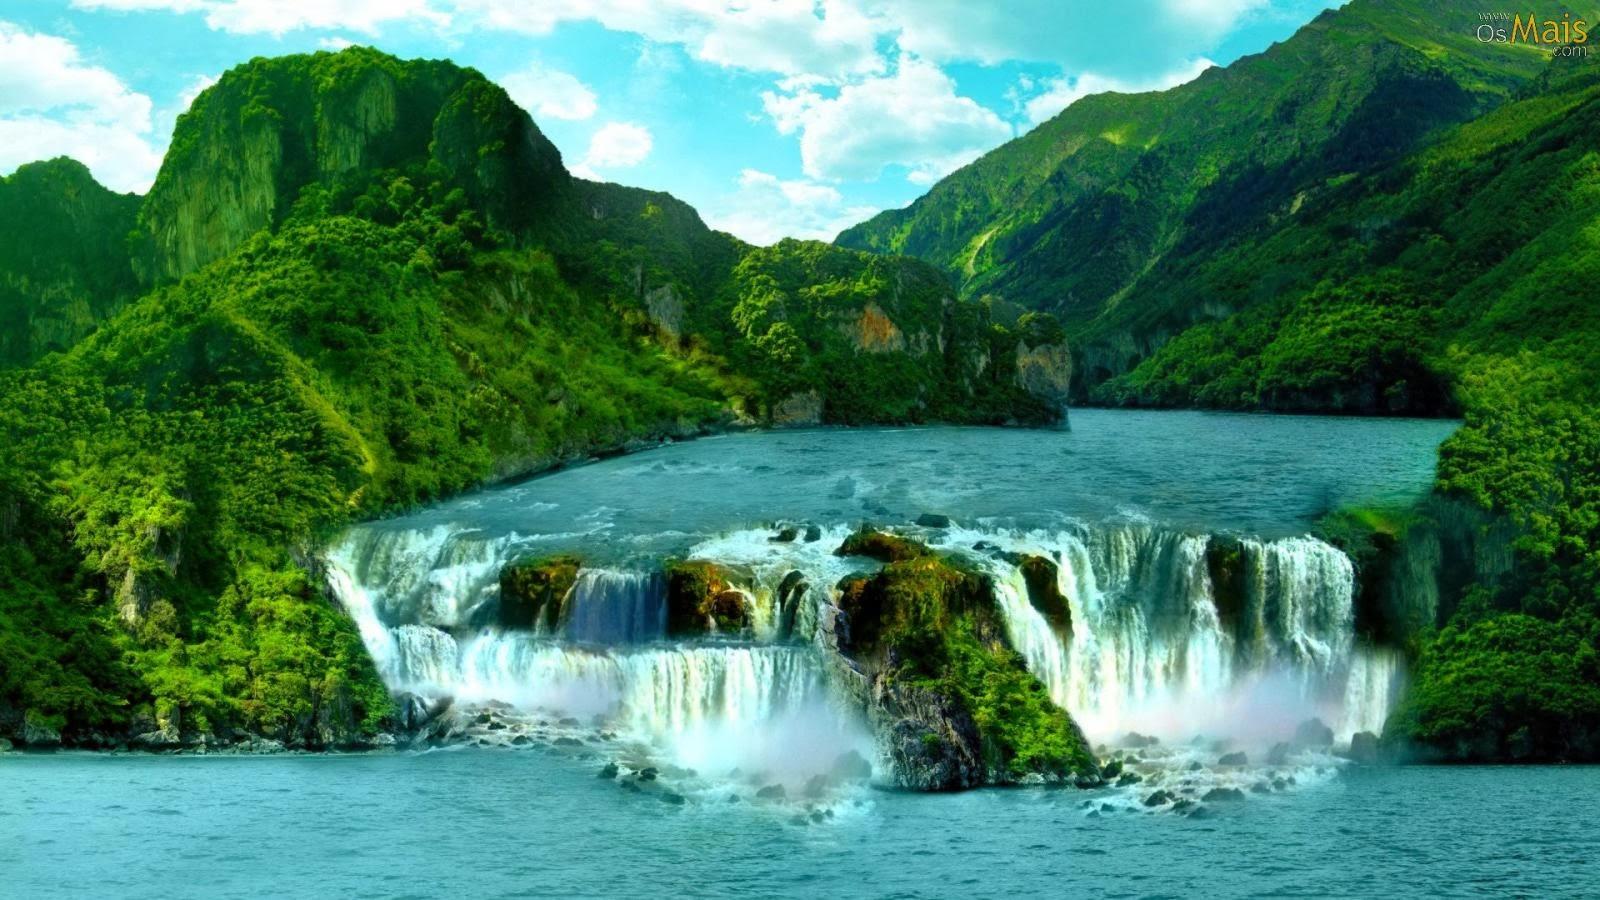 Inzo ia nzambi mbanza kiamenha natureza lugares lindos sentimentos natureza lugares lindos sentimentos mgicos imagens do corao altavistaventures Images